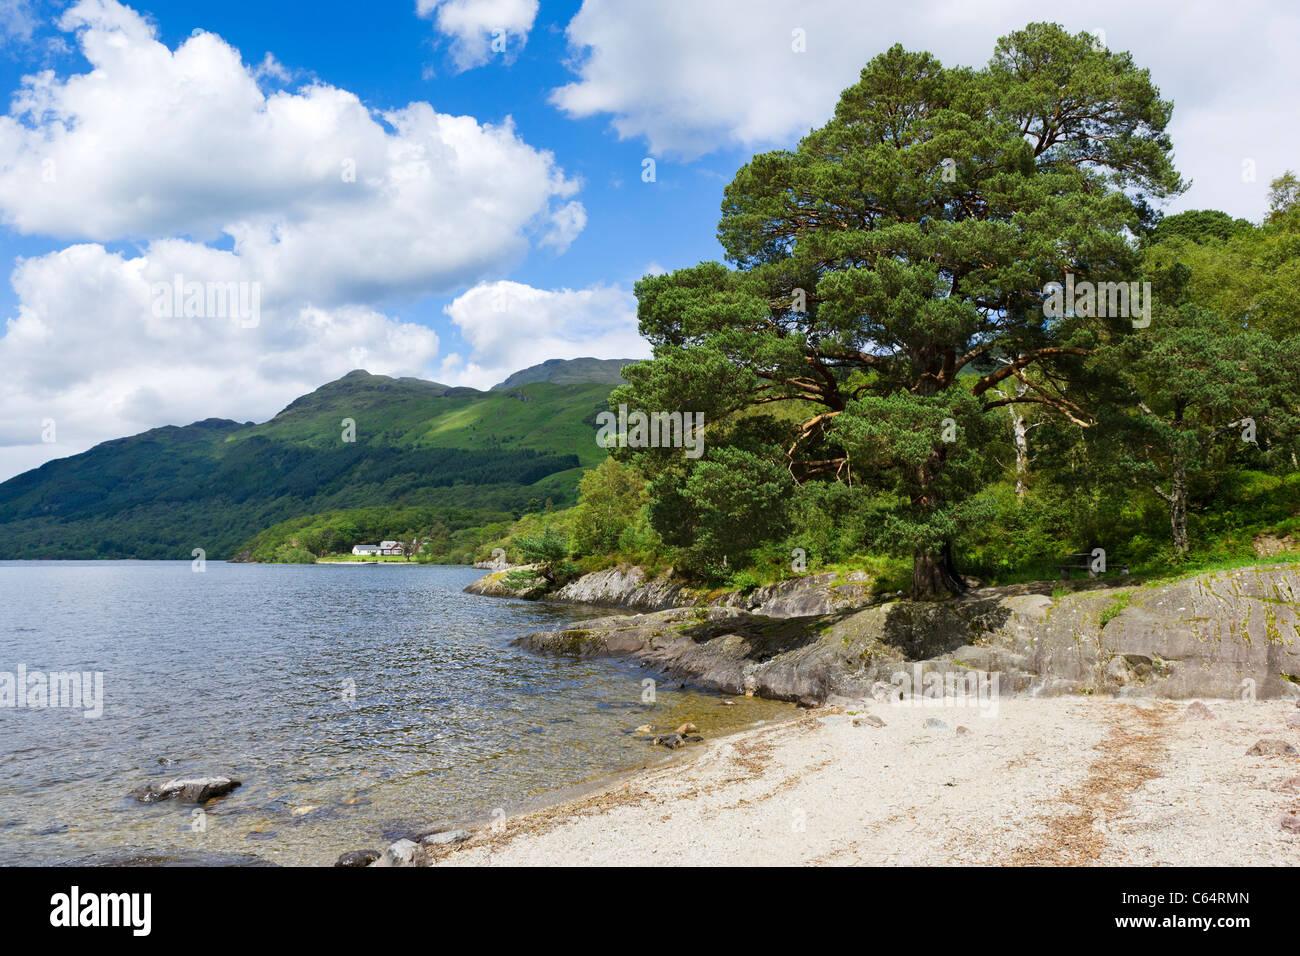 Eastern shore of Loch Lomond at Rowardennan, Scotland, UK - Stock Image